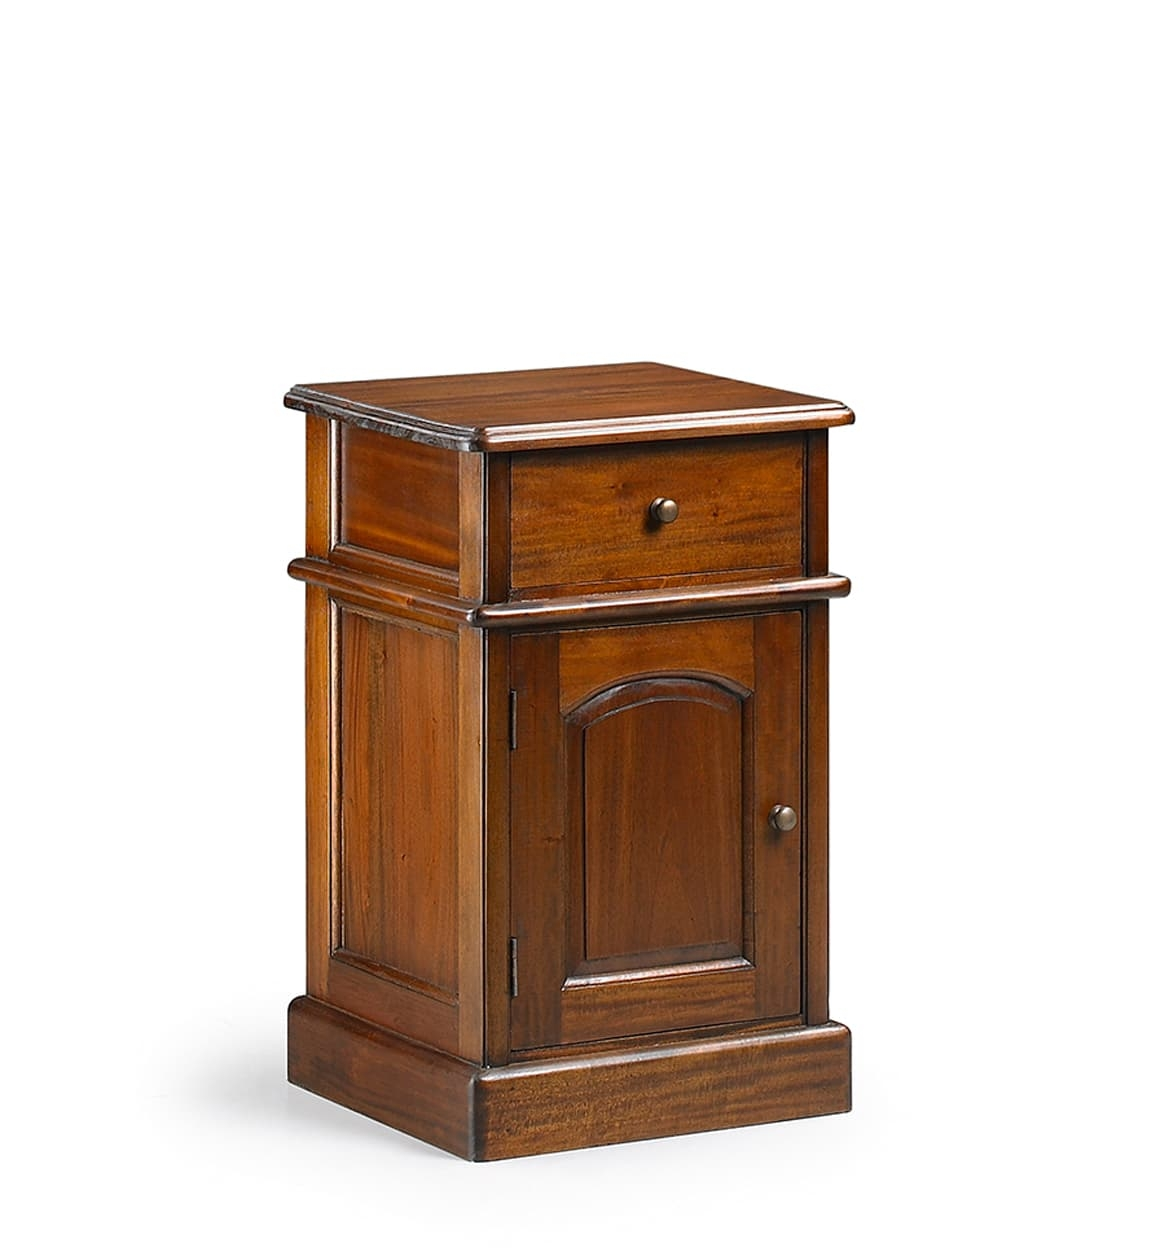 Noptiera din lemn cu 1 sertar si 1 usa, Vintage Nuc, l40xA40xH65 cm somproduct.ro